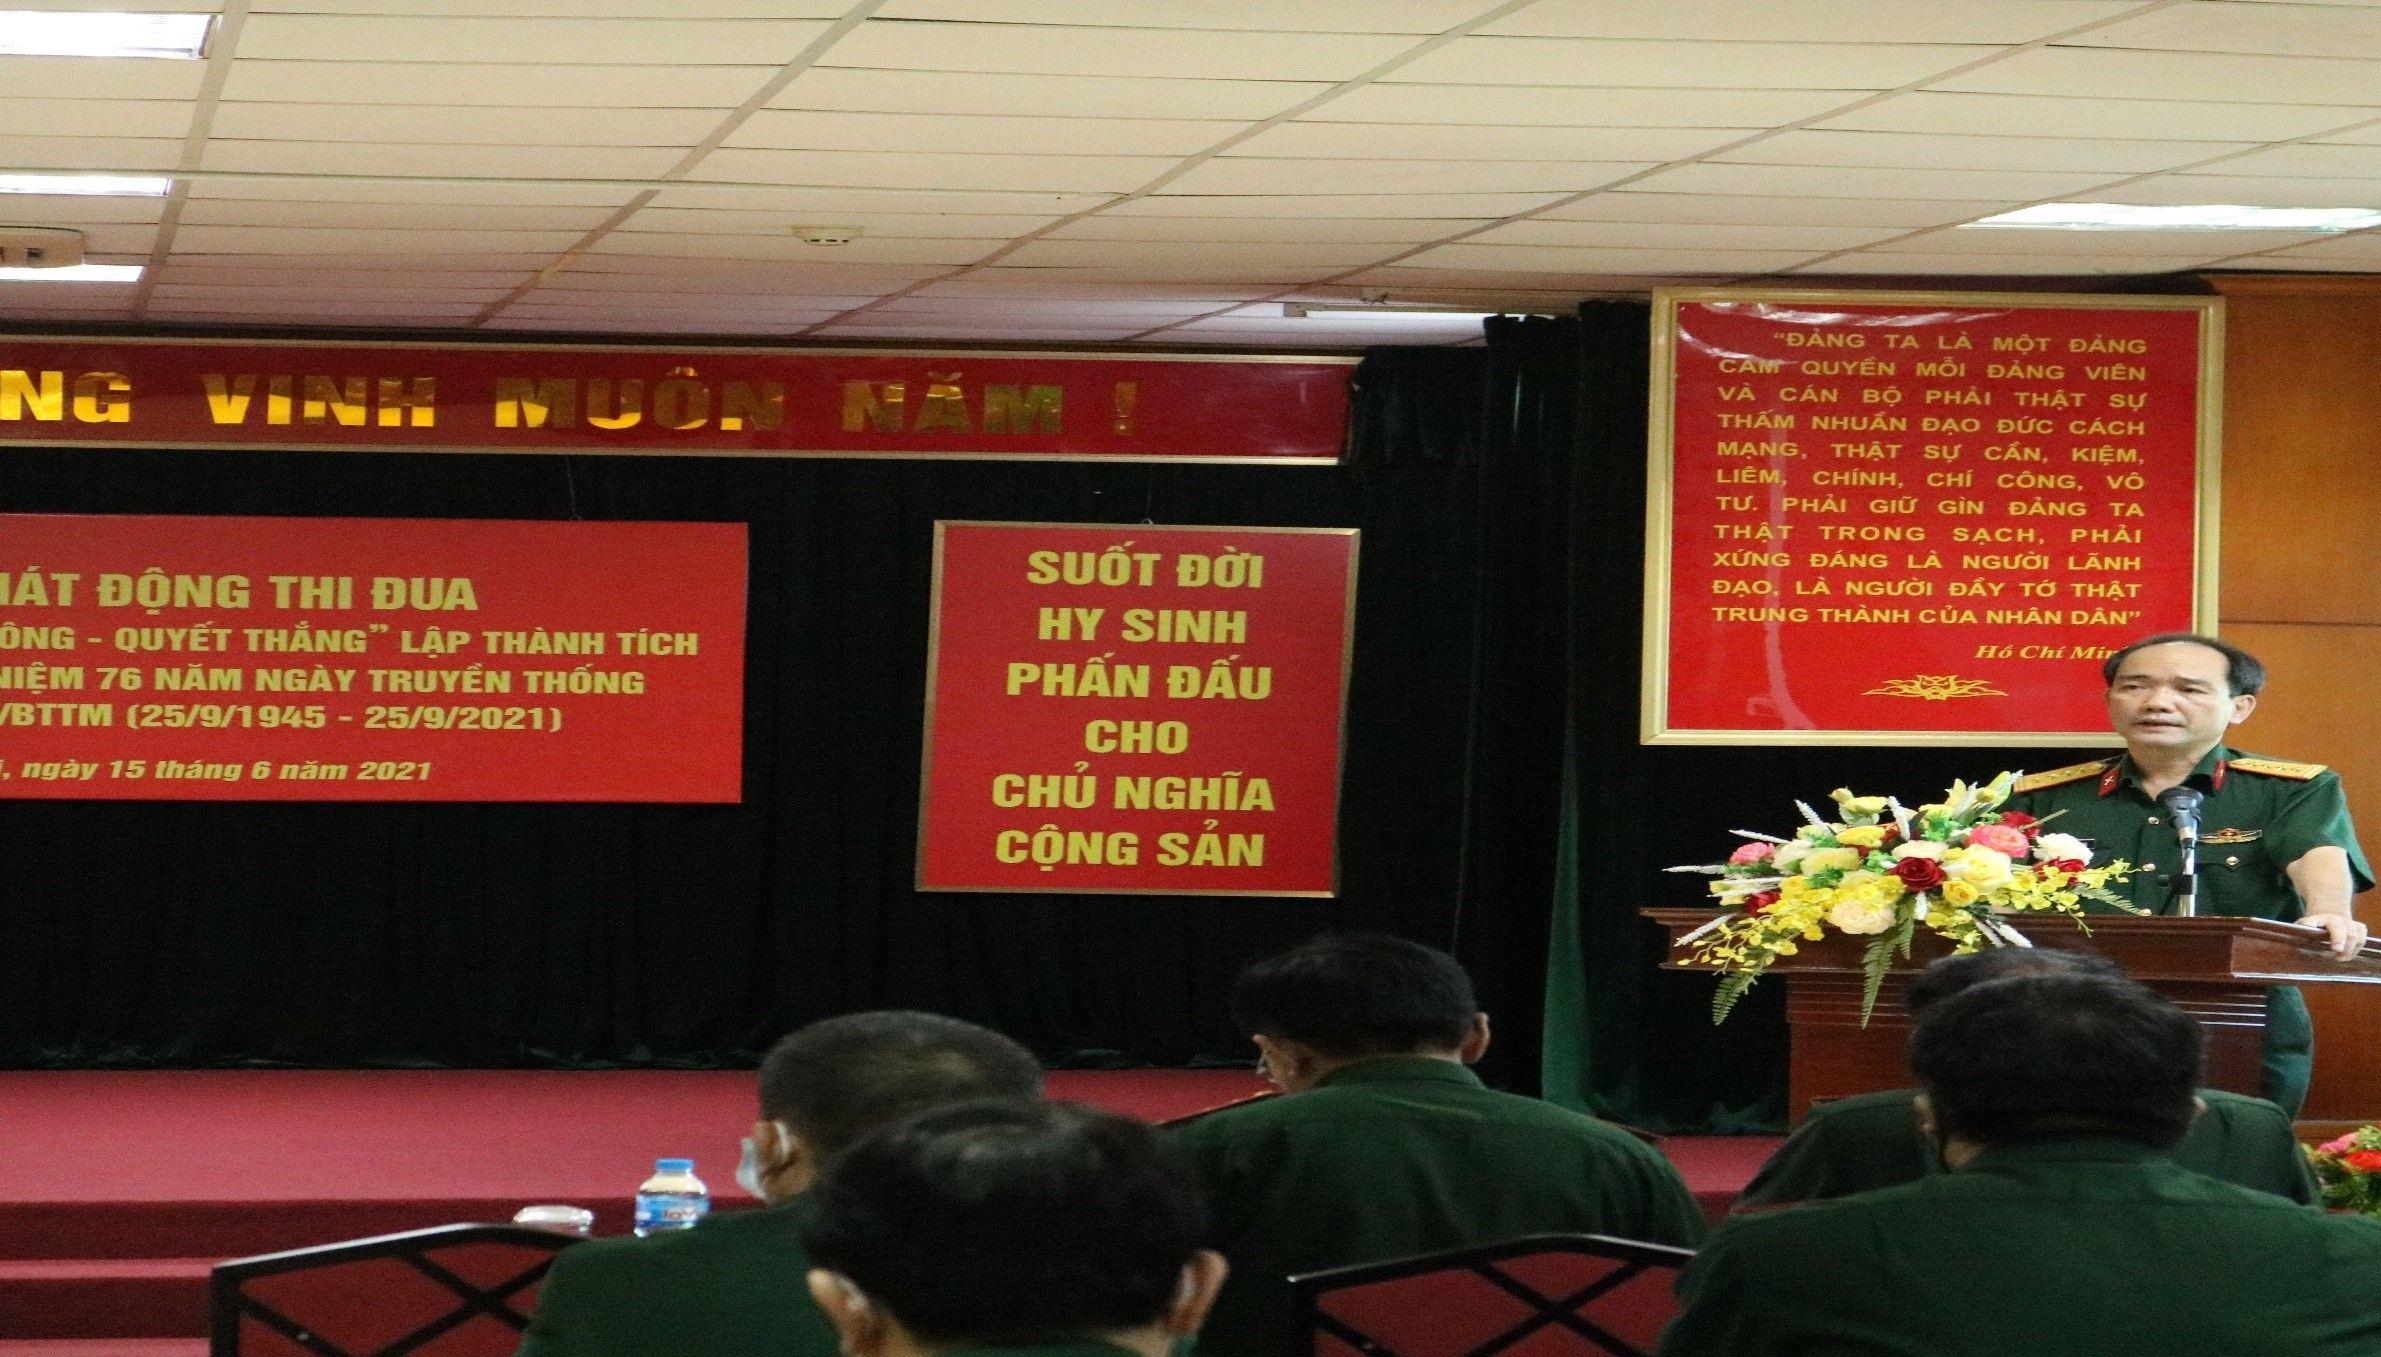 thi-dua-hoan-thanh-tot-nhiem-vu-nam-2021